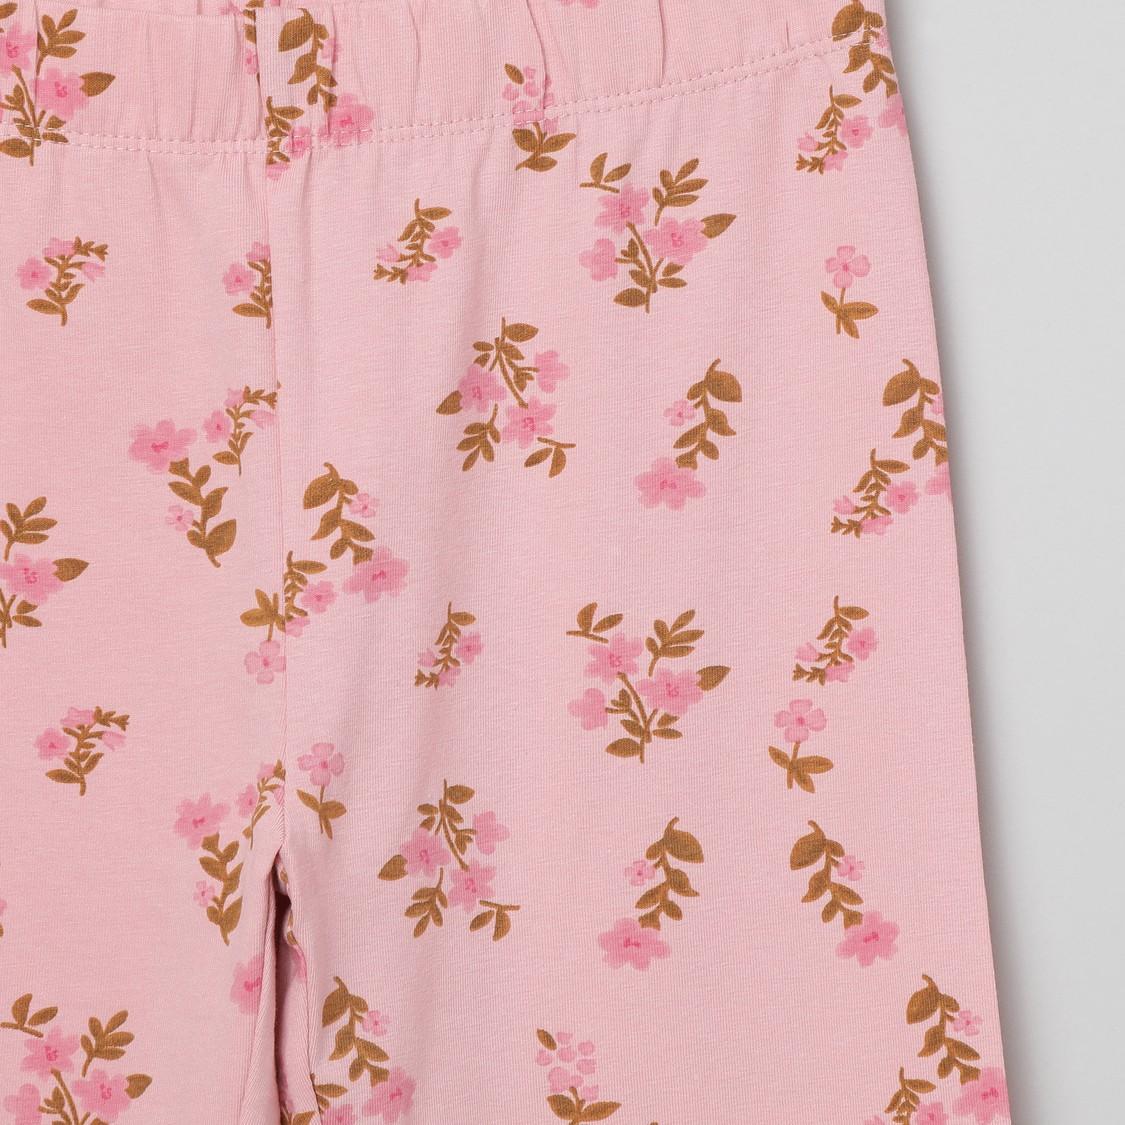 MAX Floral Print T-shirt and Elasticated Pyjamas